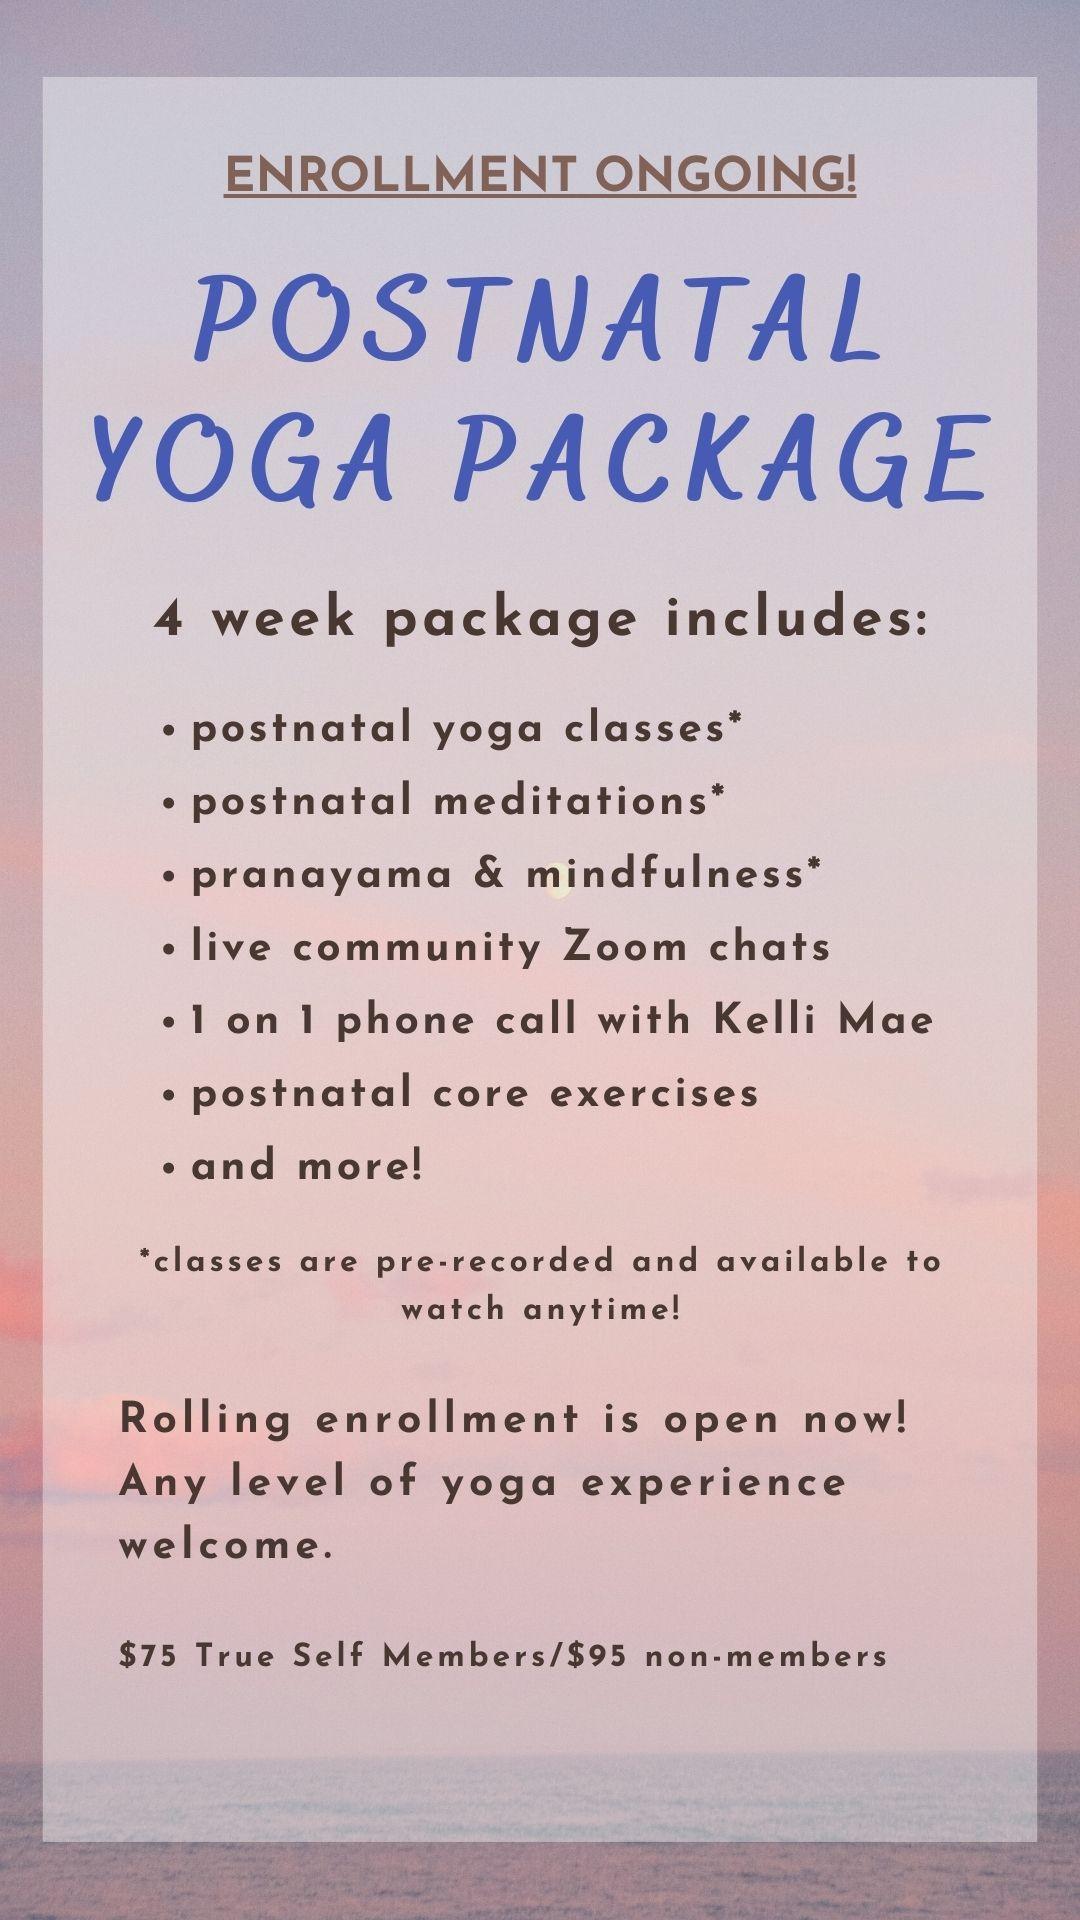 Postnatal Yoga Package